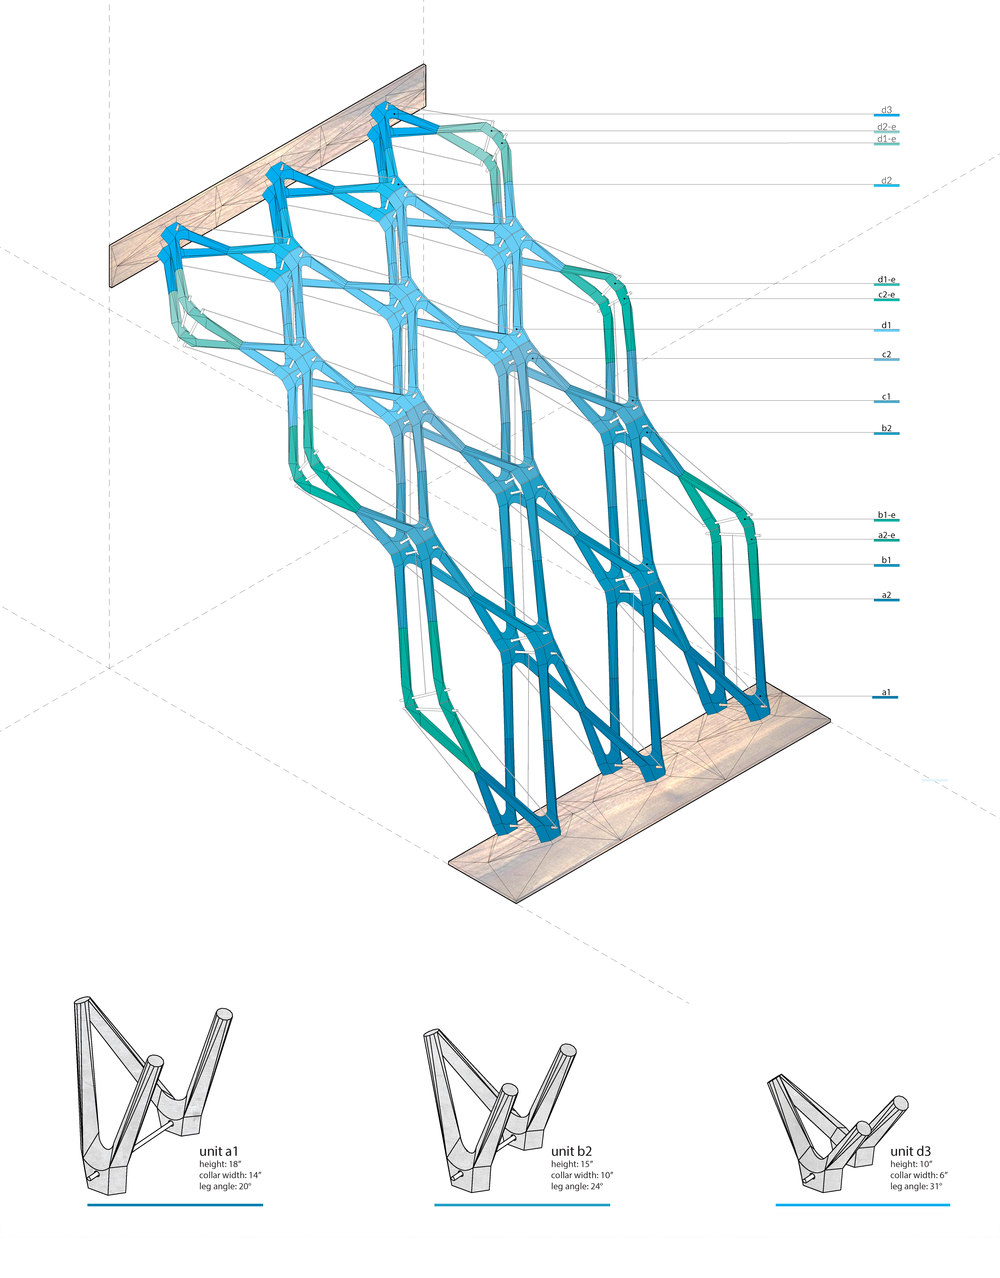 vault_components_final.jpg